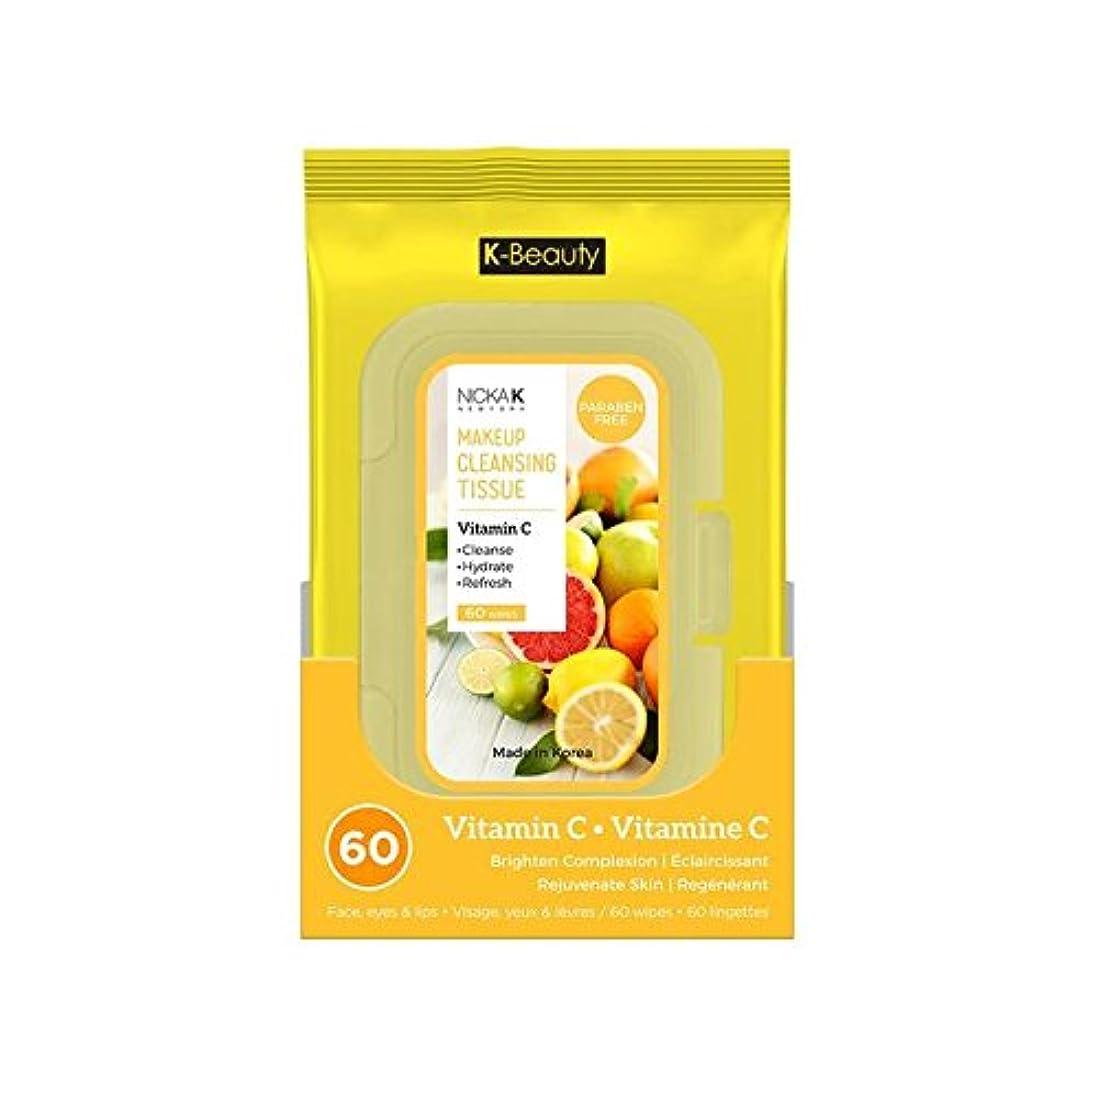 (3 Pack) NICKA K Make Up Cleansing Tissue - Vitamin C (並行輸入品)